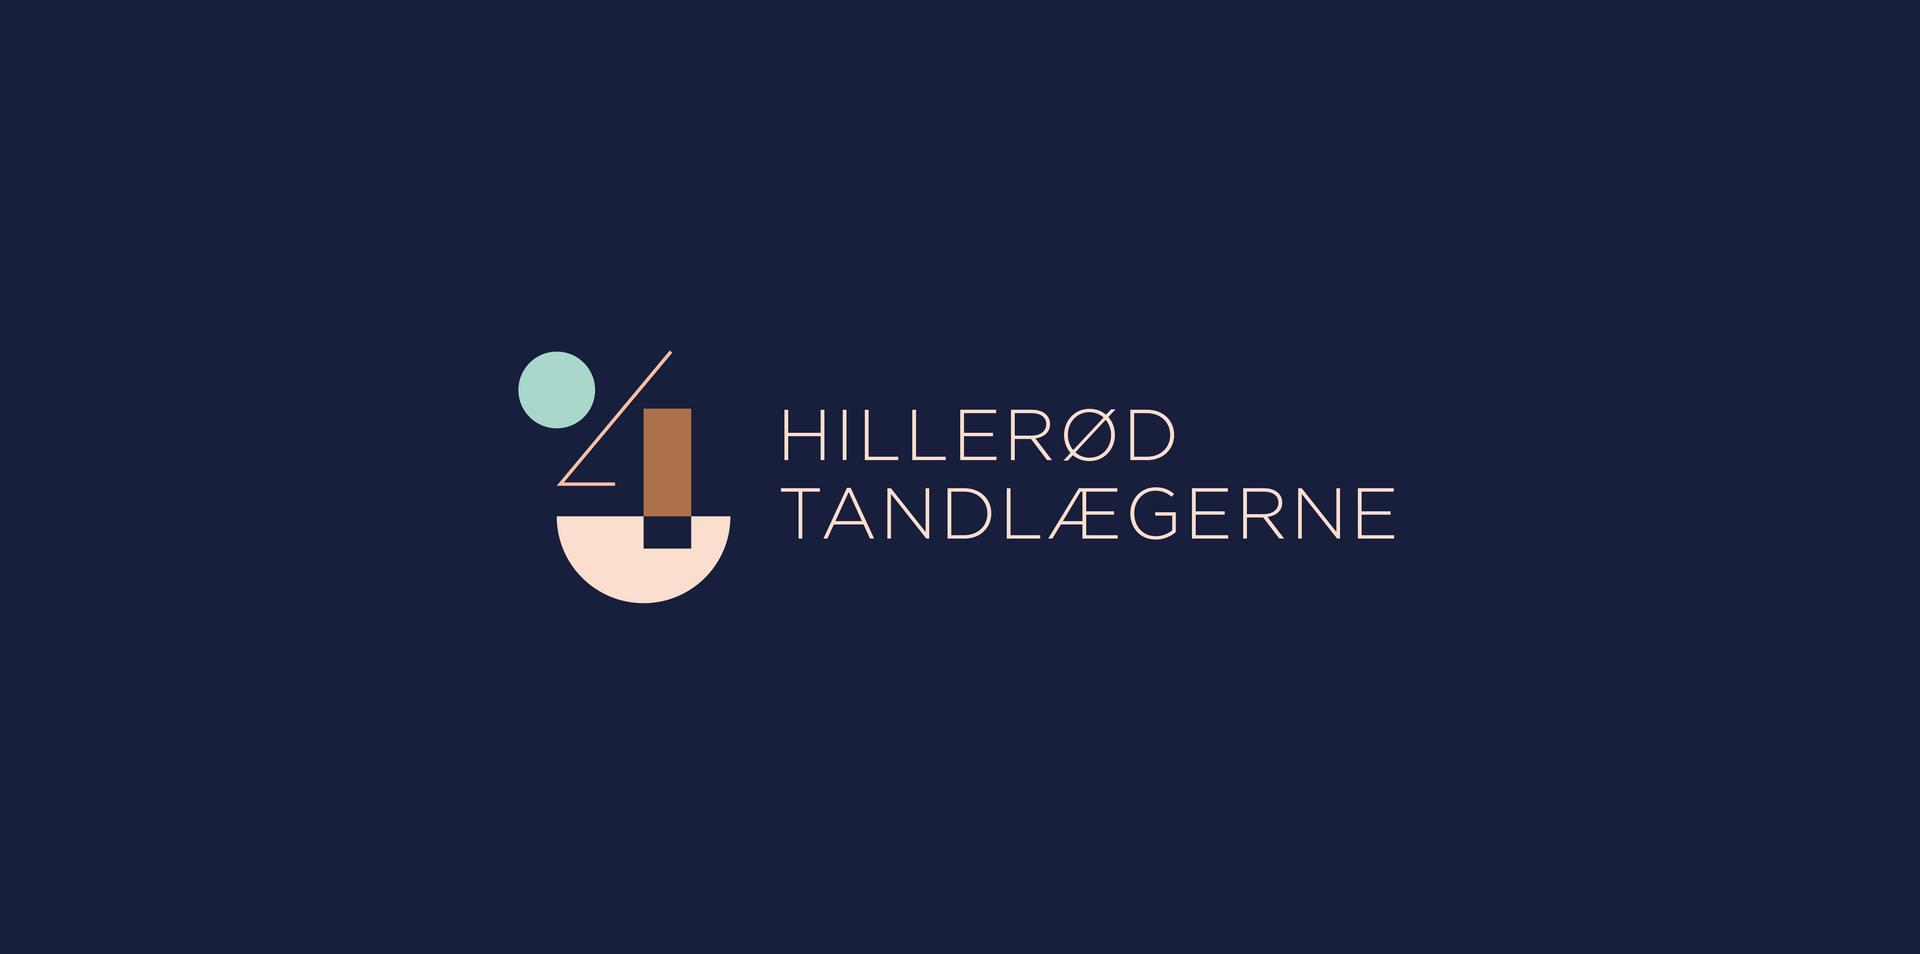 Hillerød Tandlægerne - logo